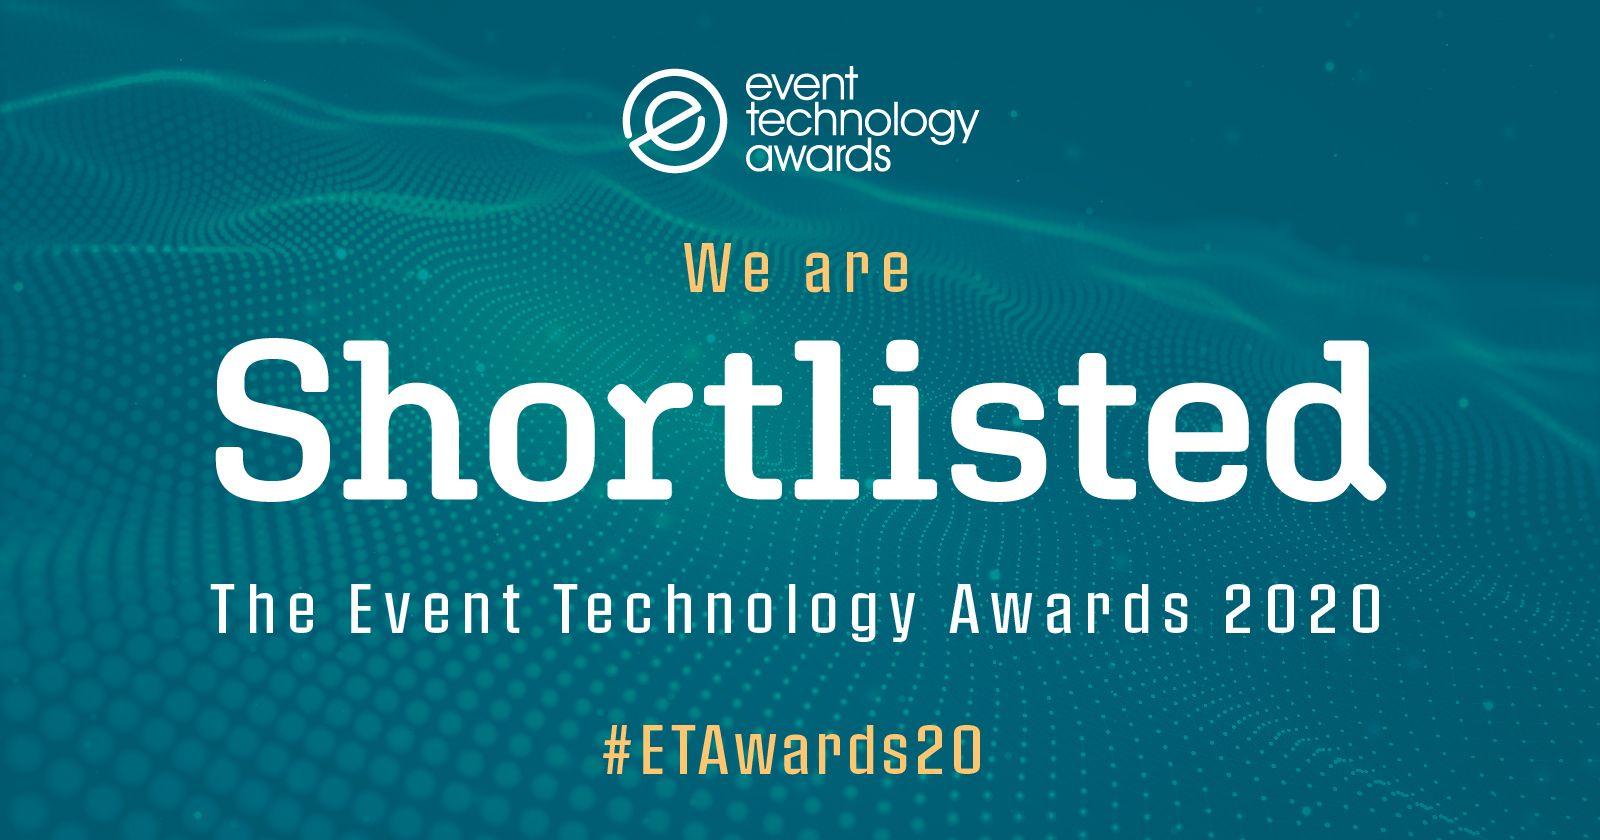 Event Technology Awards 2020